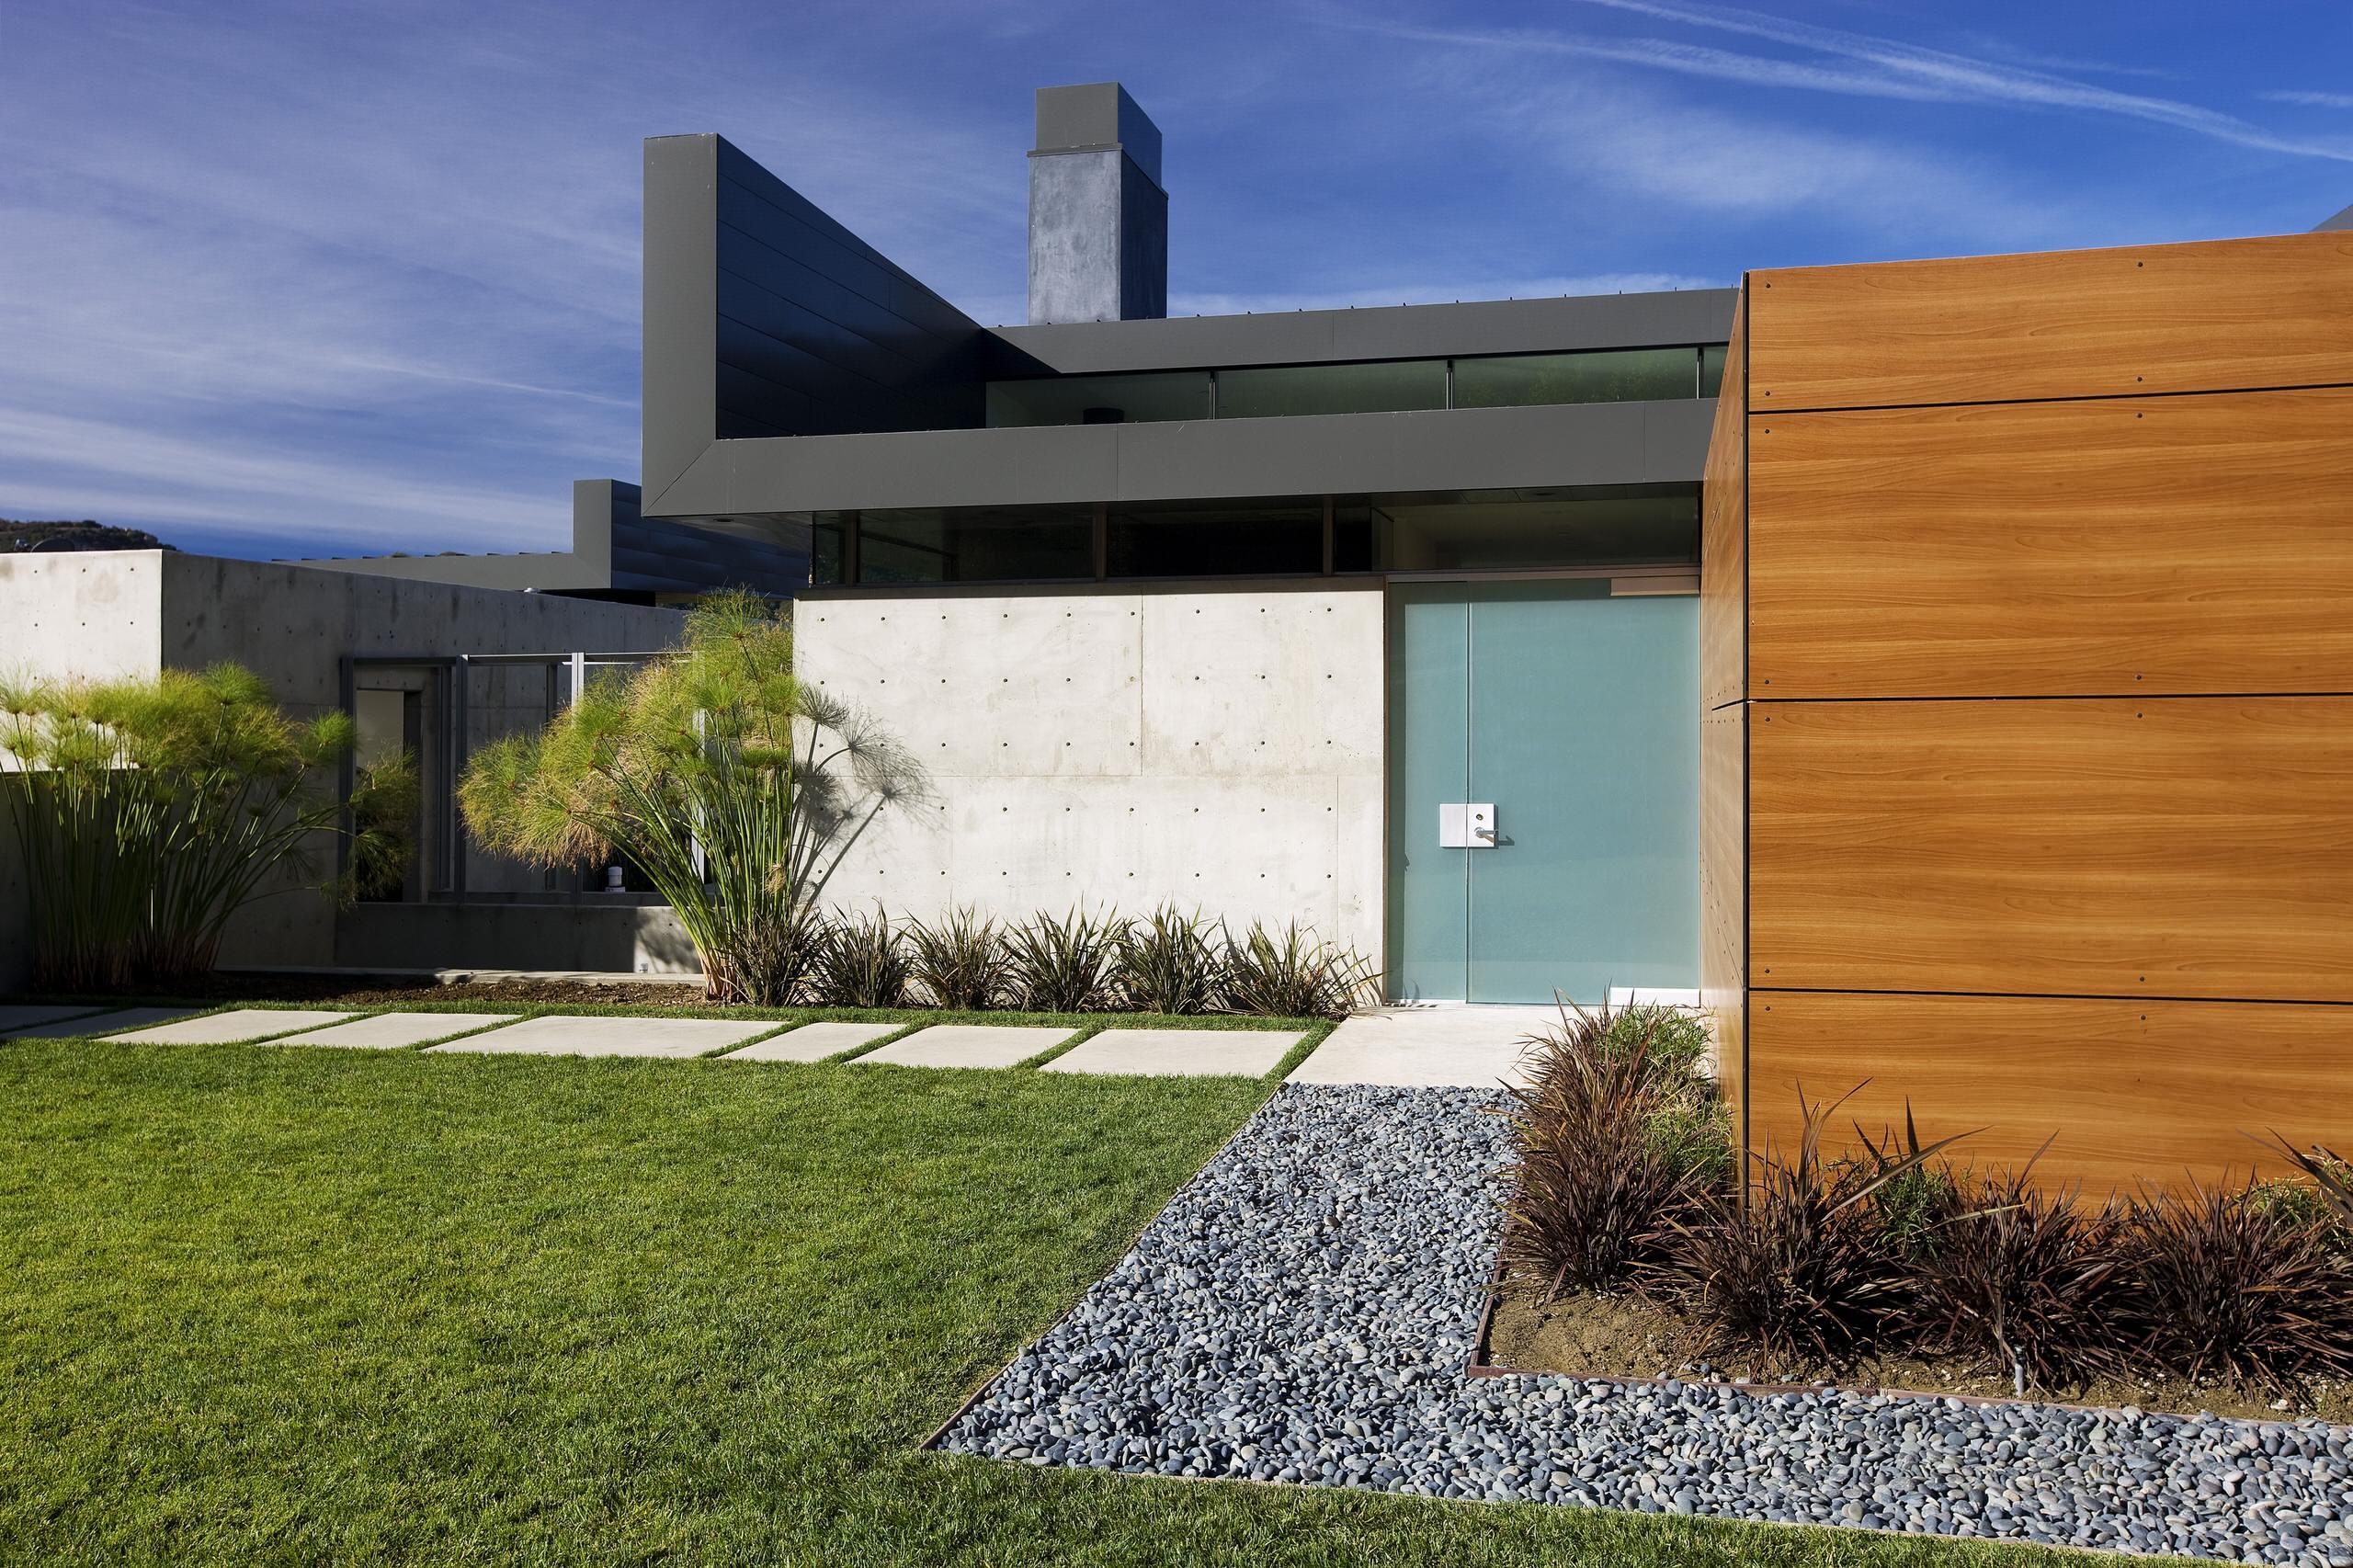 lima residence abramson architects img~4ec1260c0edf946c 14 3991 1 5fbf519